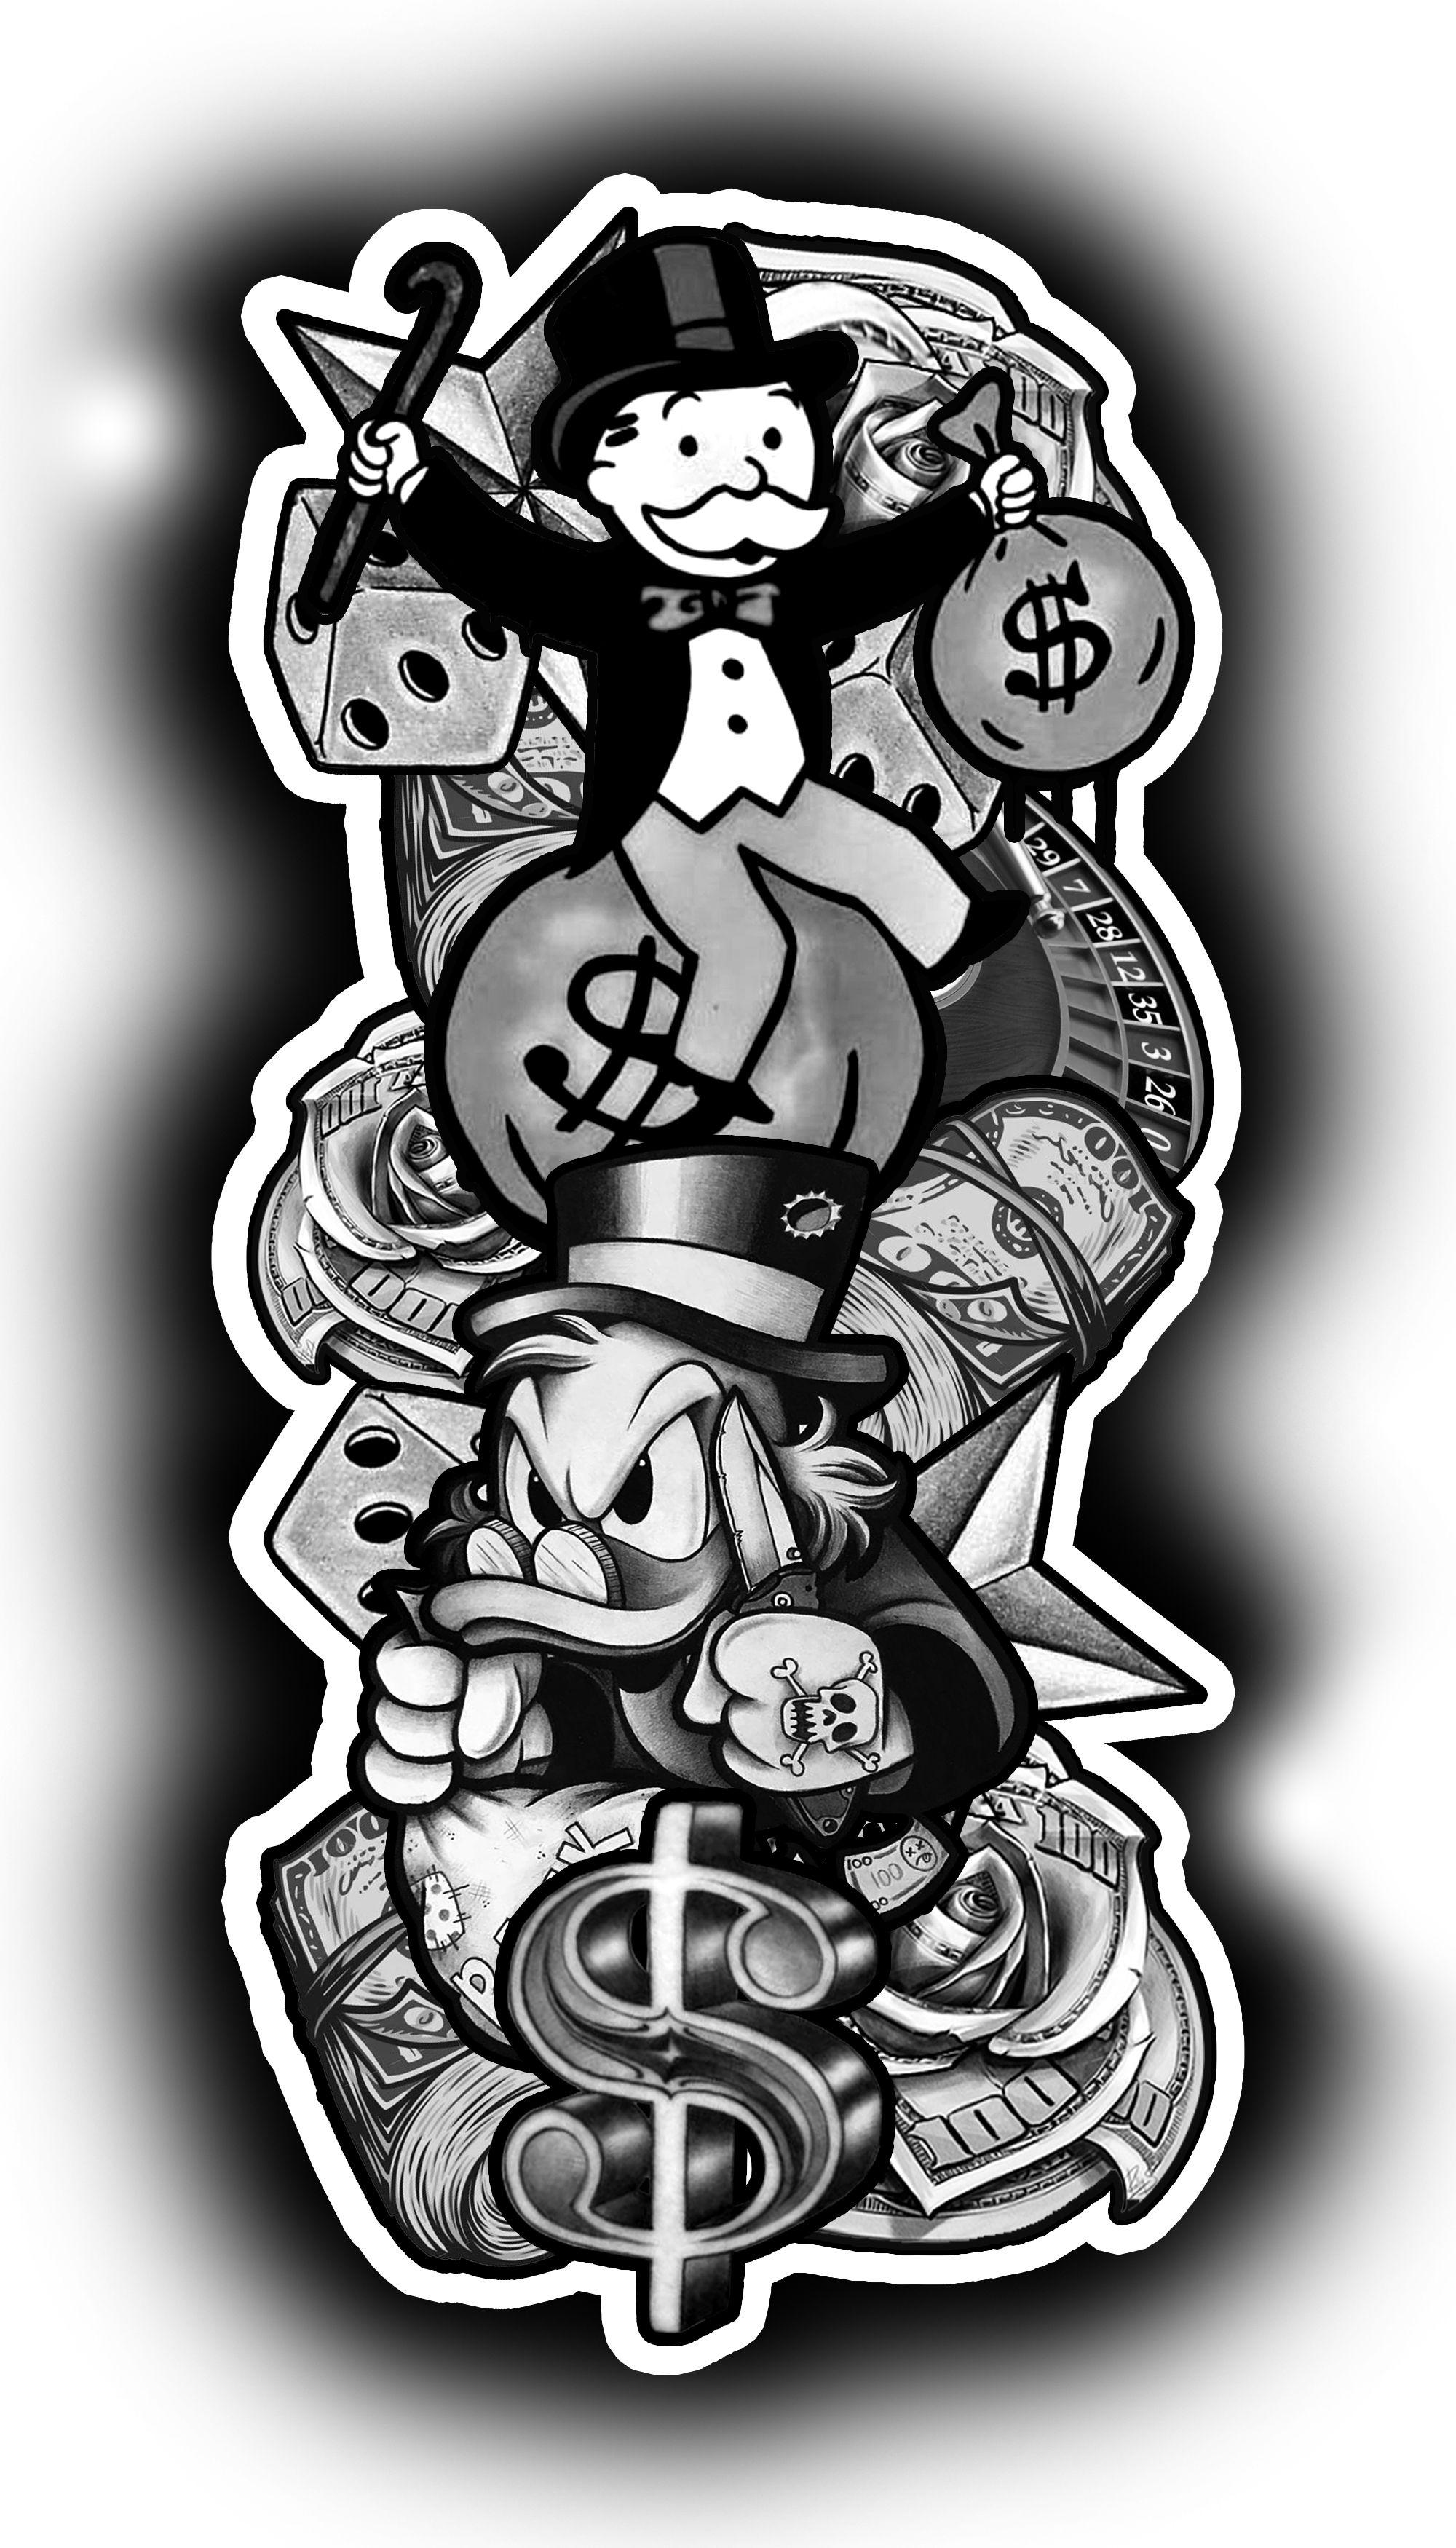 Gangster Monopoly Man Tattoo : gangster, monopoly, tattoo, Patinhas, Monopoly, Tattoo, Tatuagem, Palhaço,, Dinheiro,, Mitologia, Grega